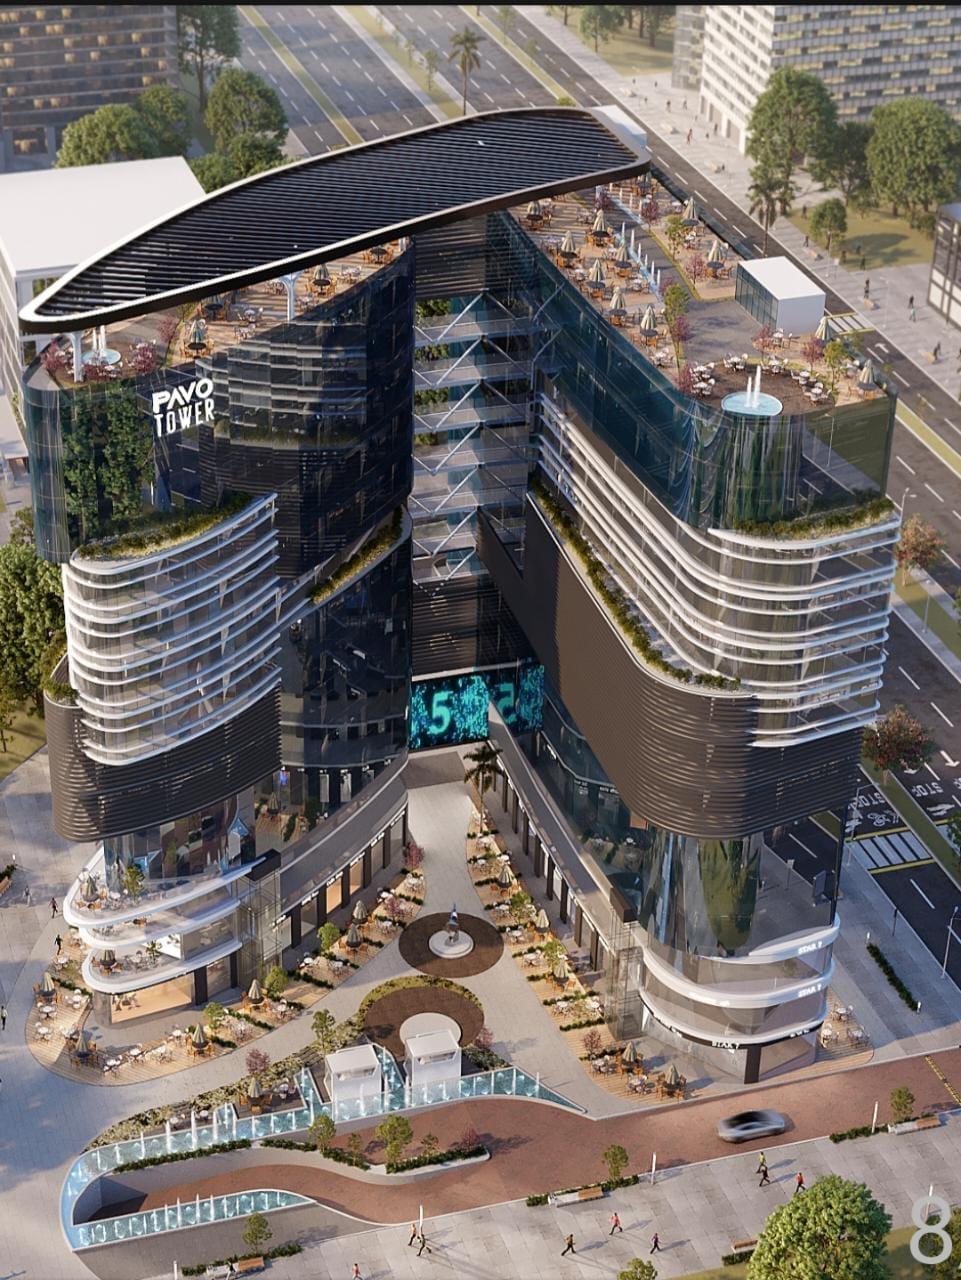 Pavo Tower New Capital